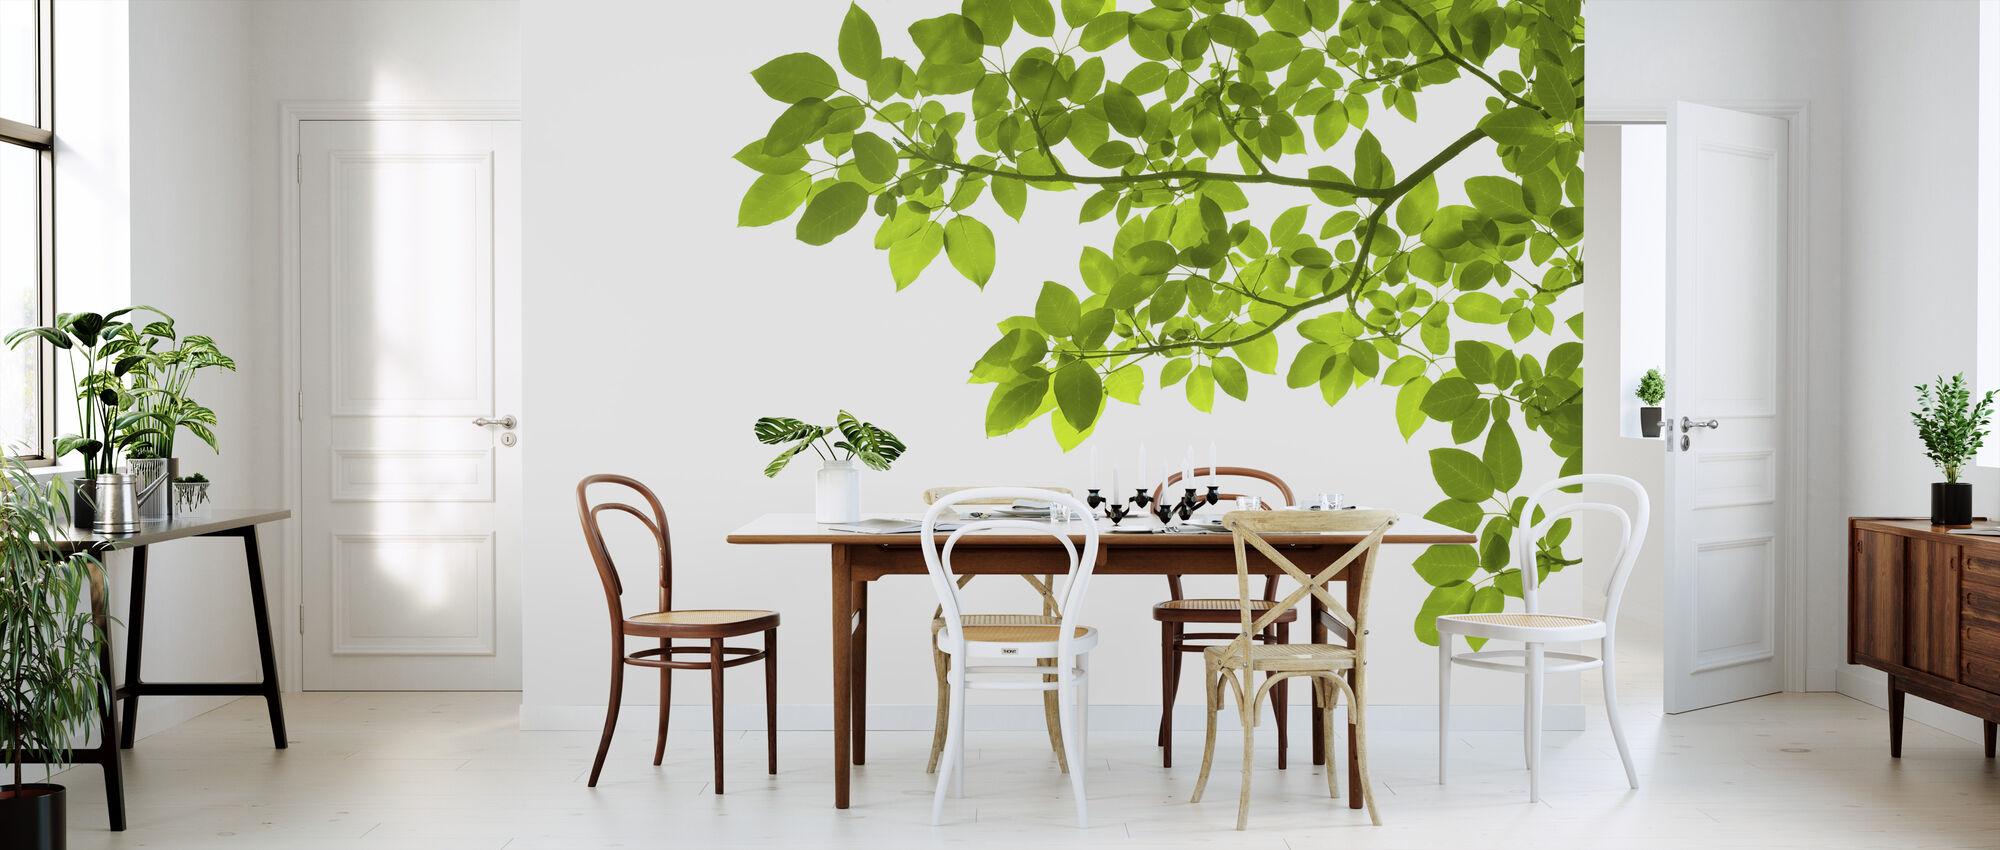 Green Leaves Corner - Wallpaper - Kitchen